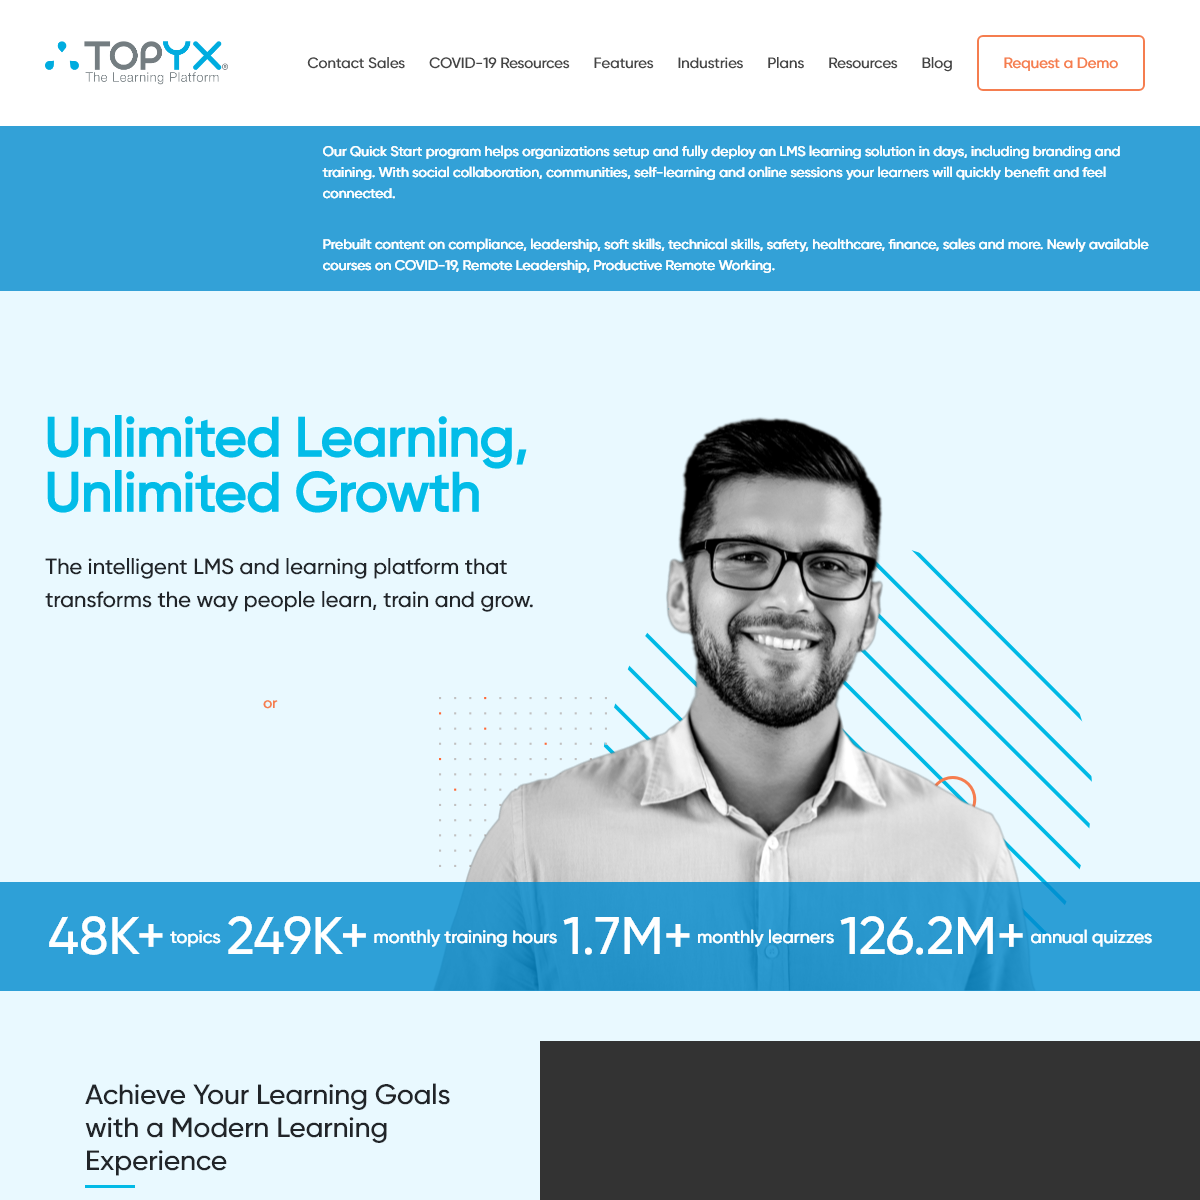 TOPYX Learning Management System (LMS) and Online Training Platform